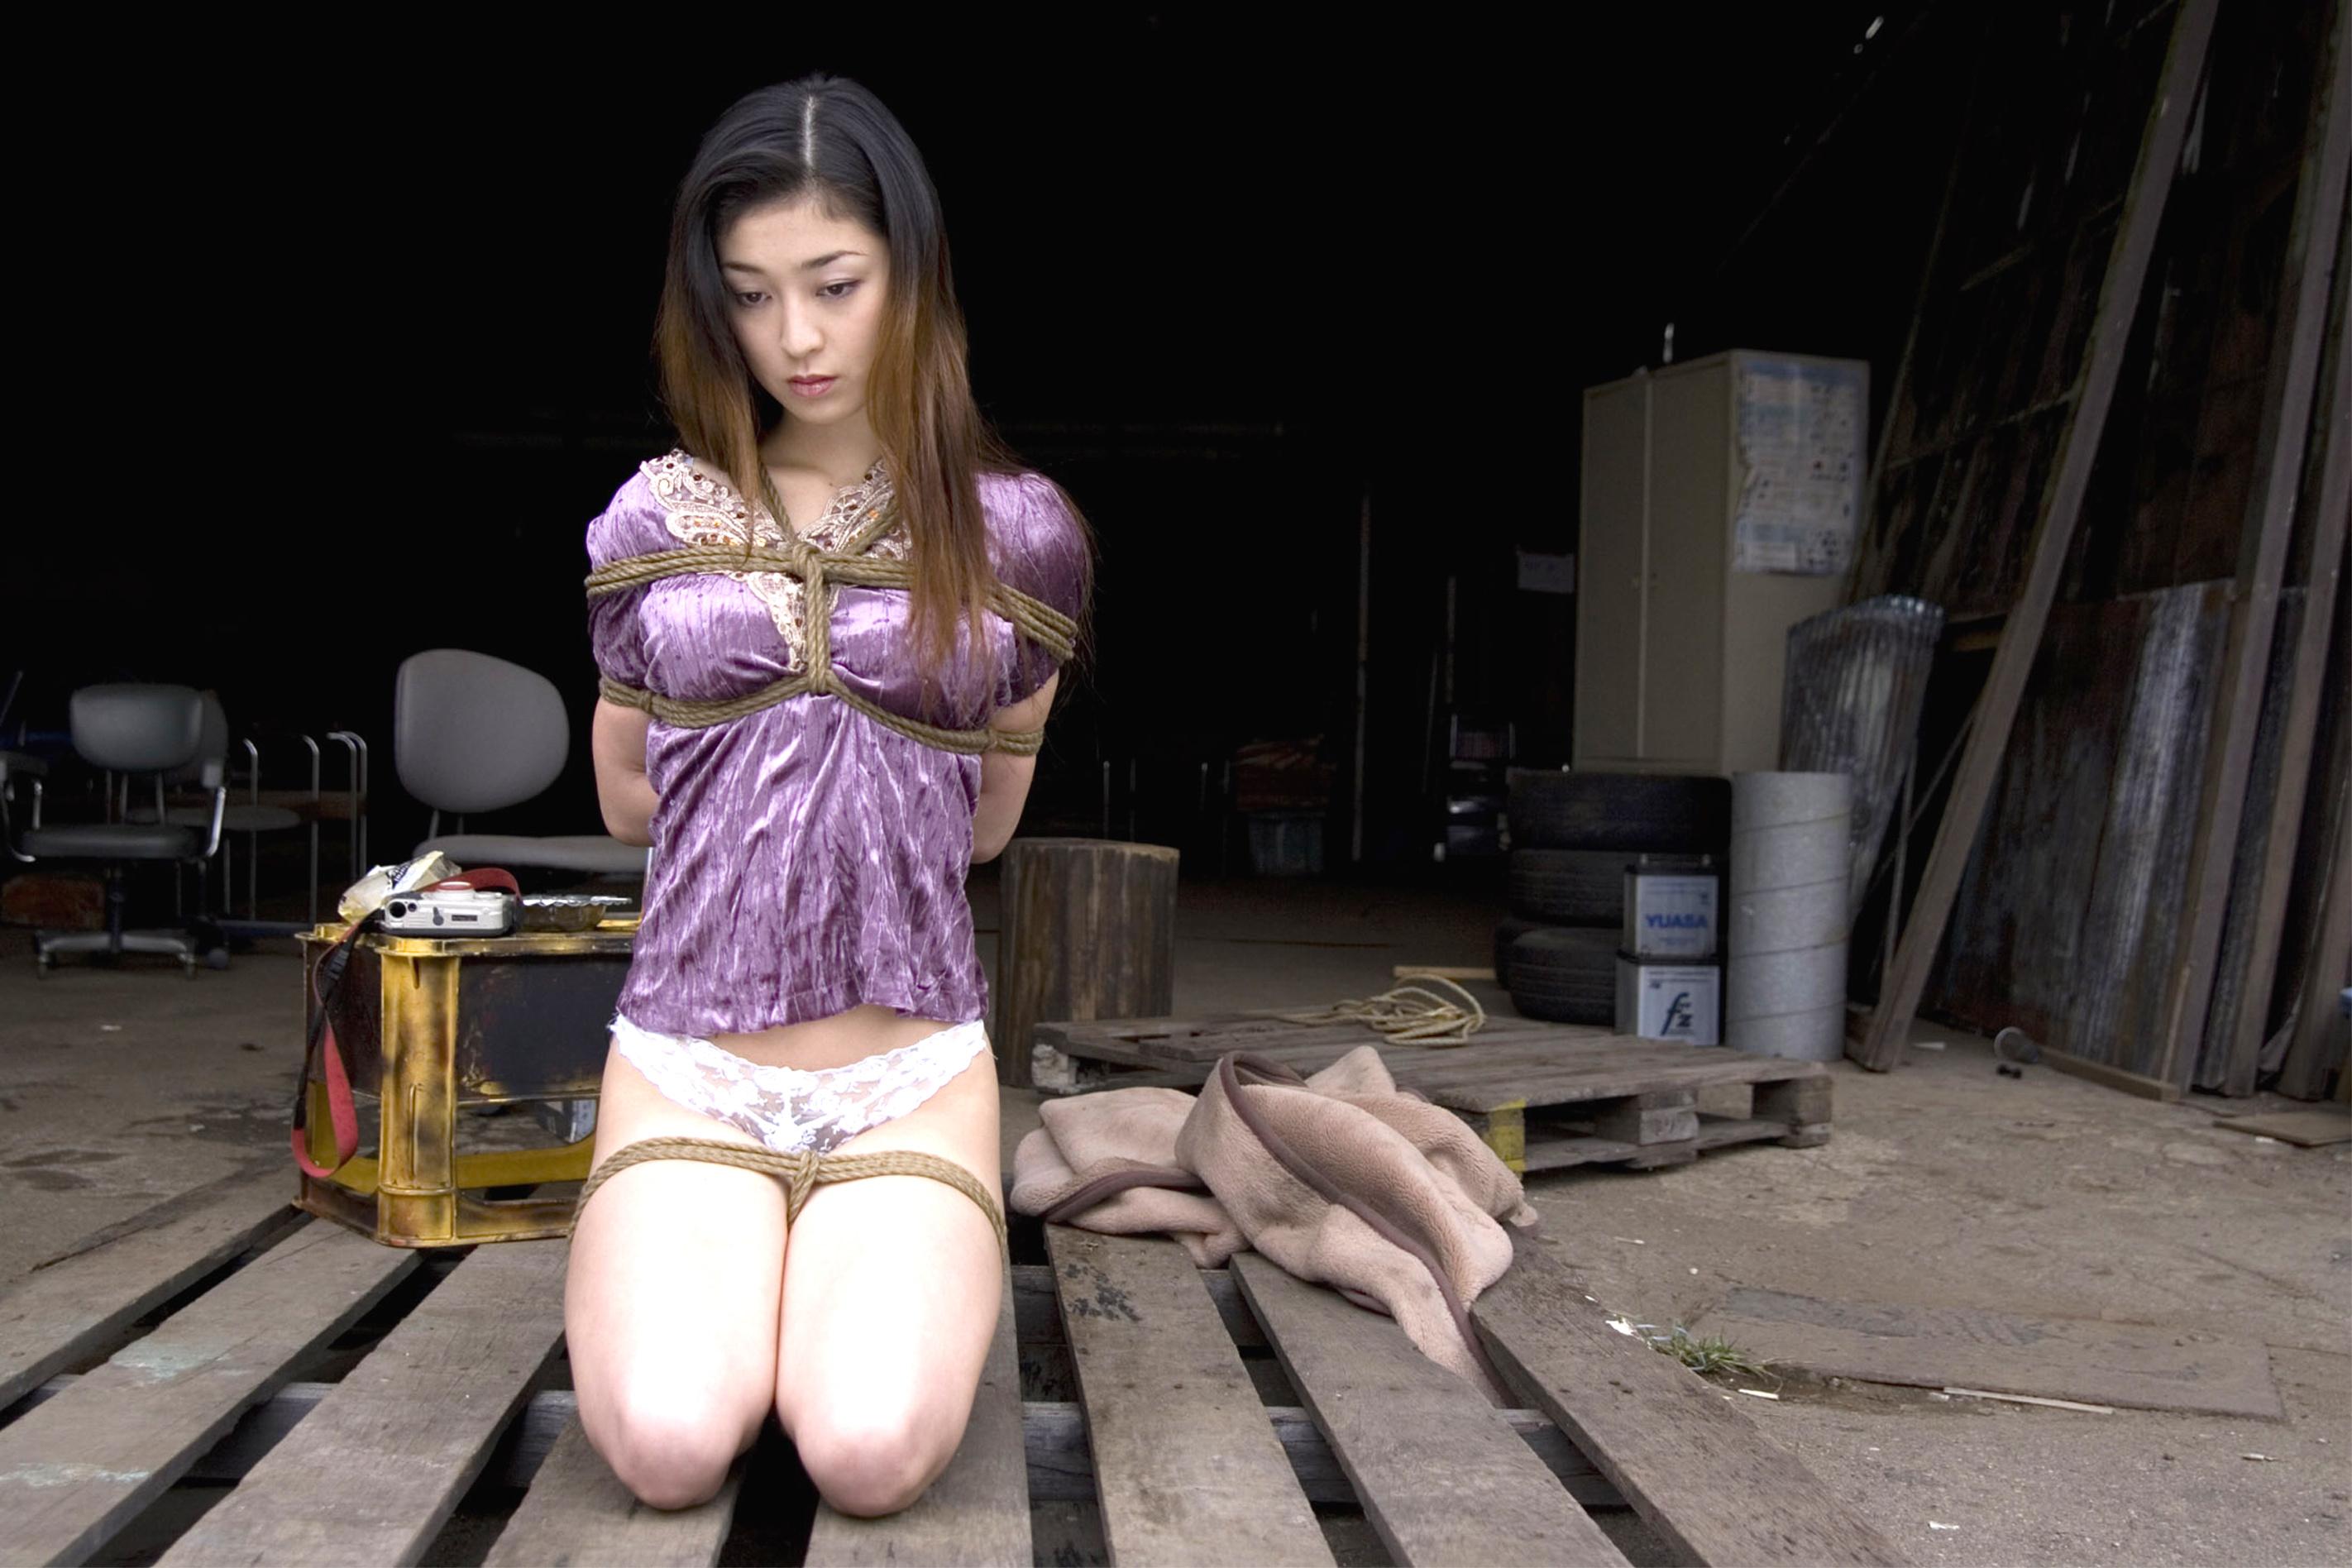 Wallpaper Chiaki Kurihara, Rope, Restriction, Asian, Nude -7352